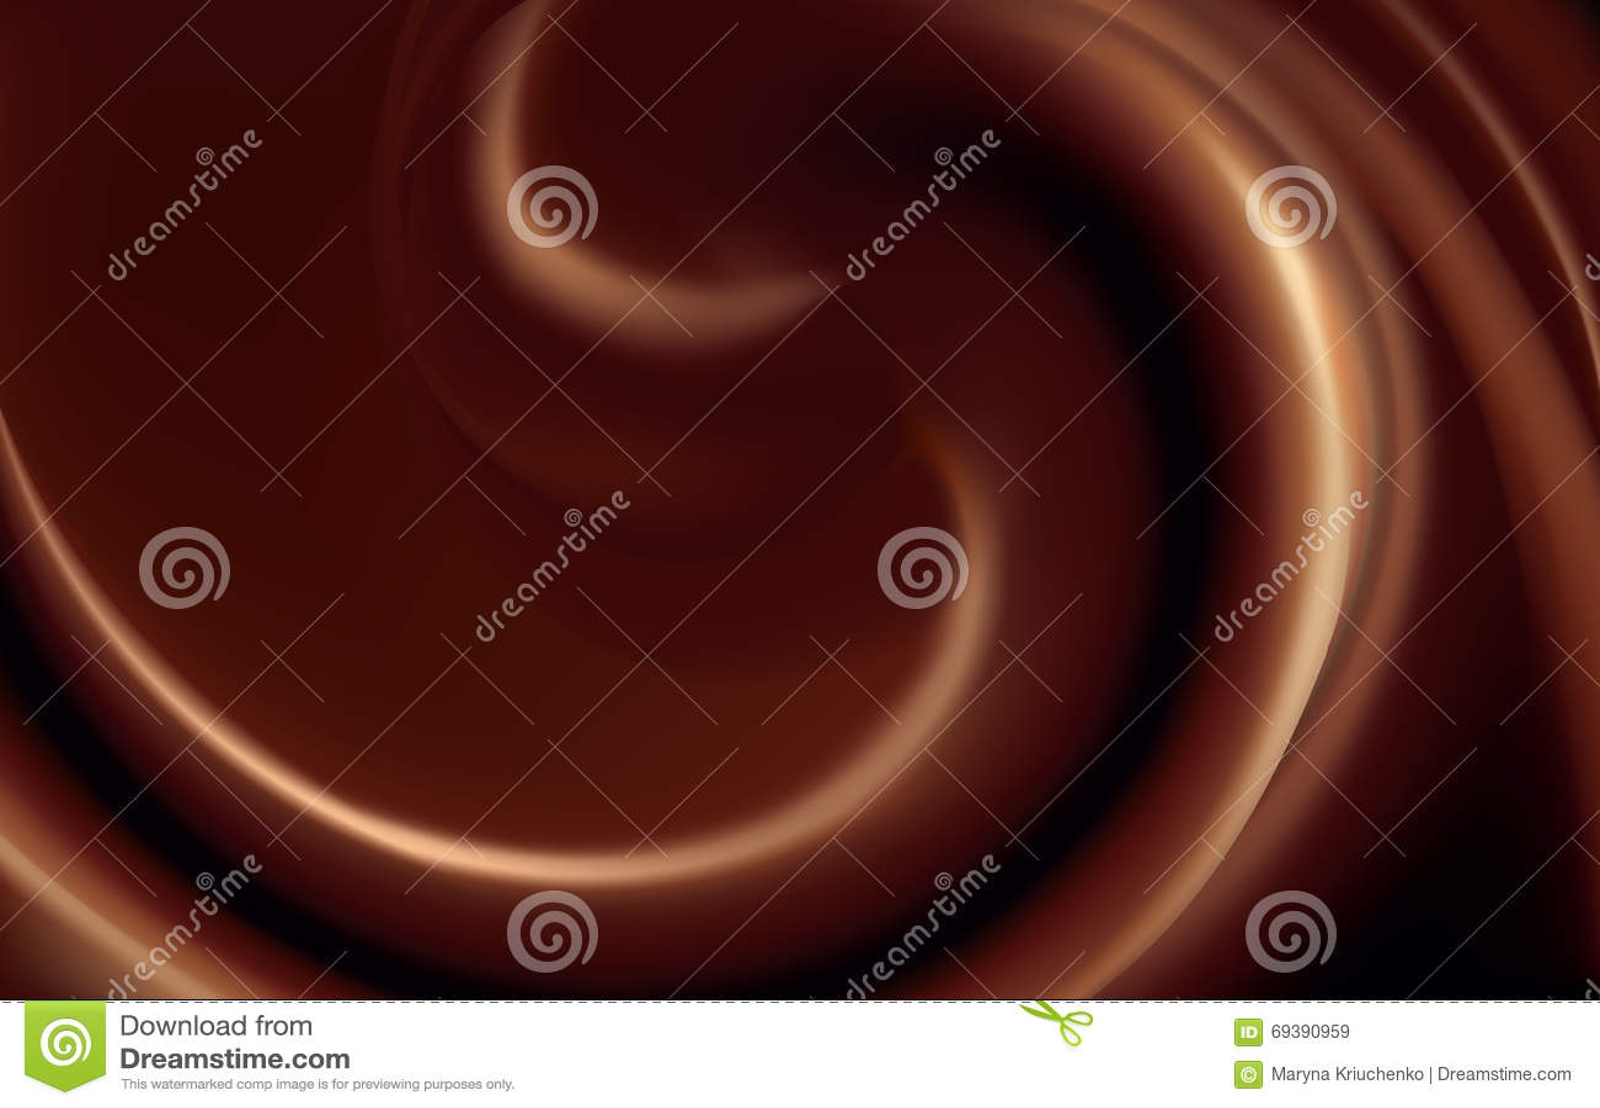 Vectorachtergrond van wervelende donkere chocoladetextuur